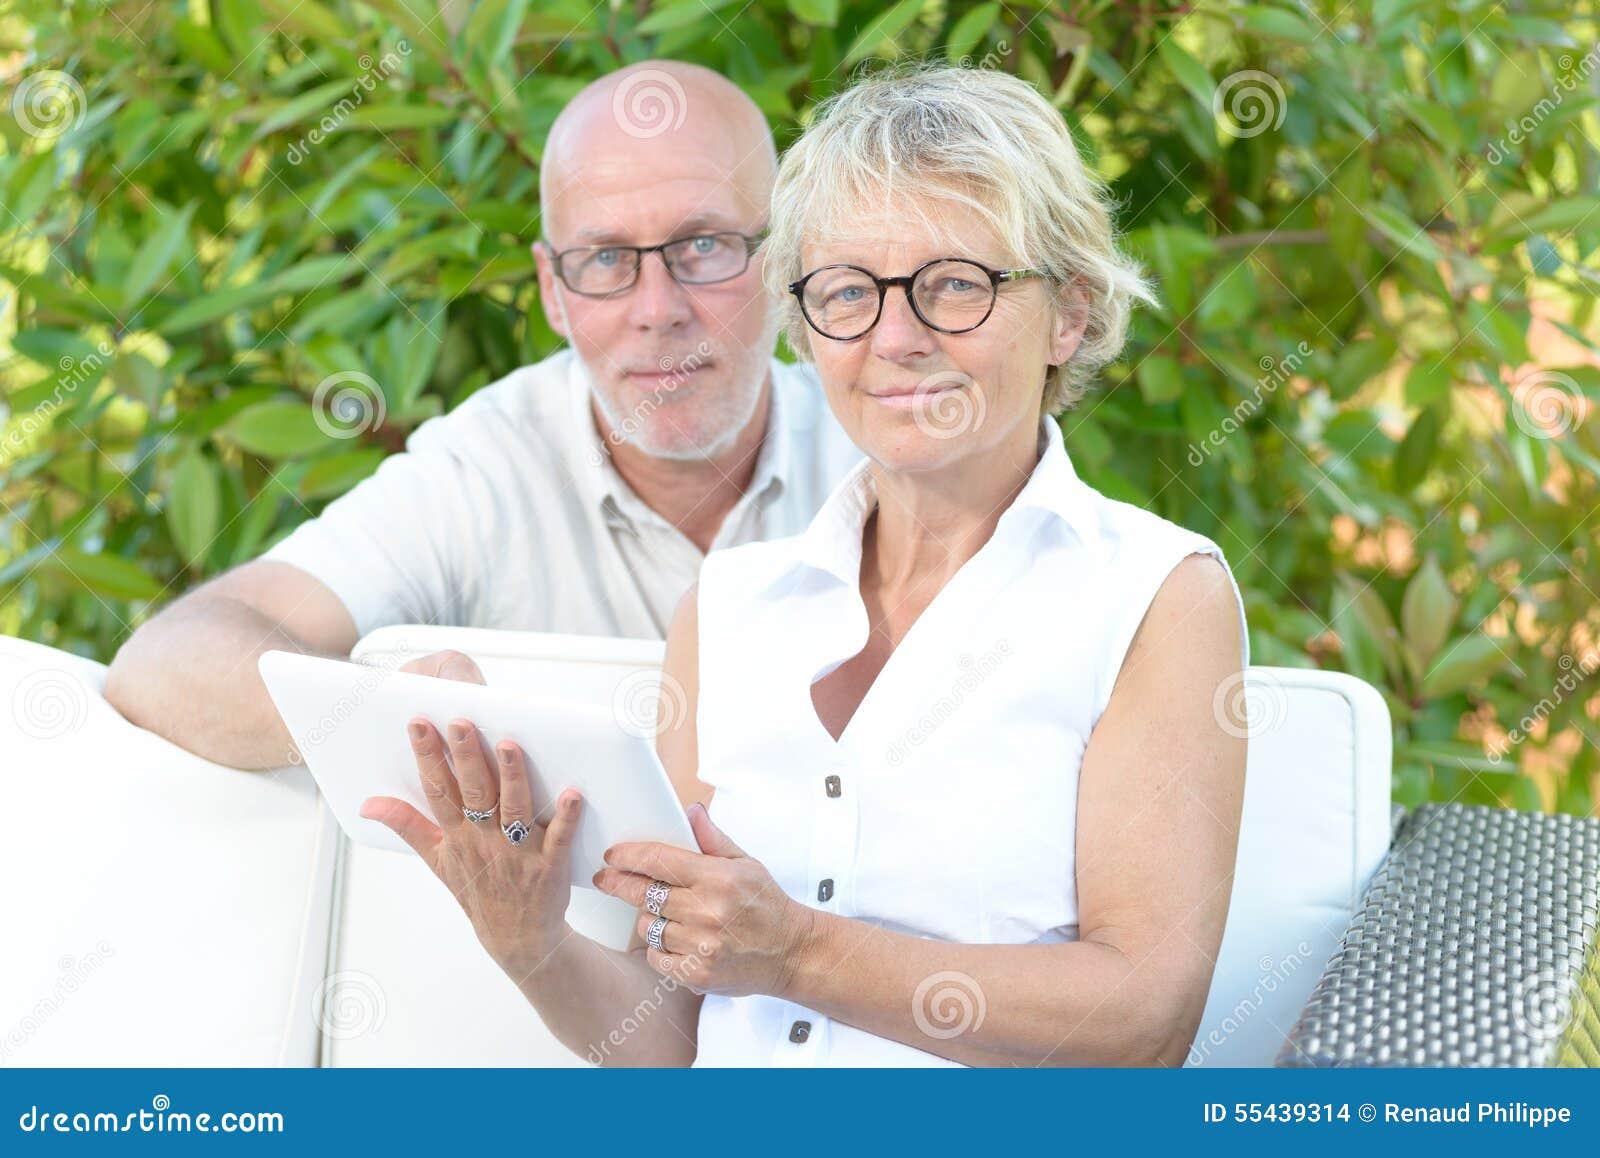 Philadelphia Jewish Senior Singles Dating Online Site